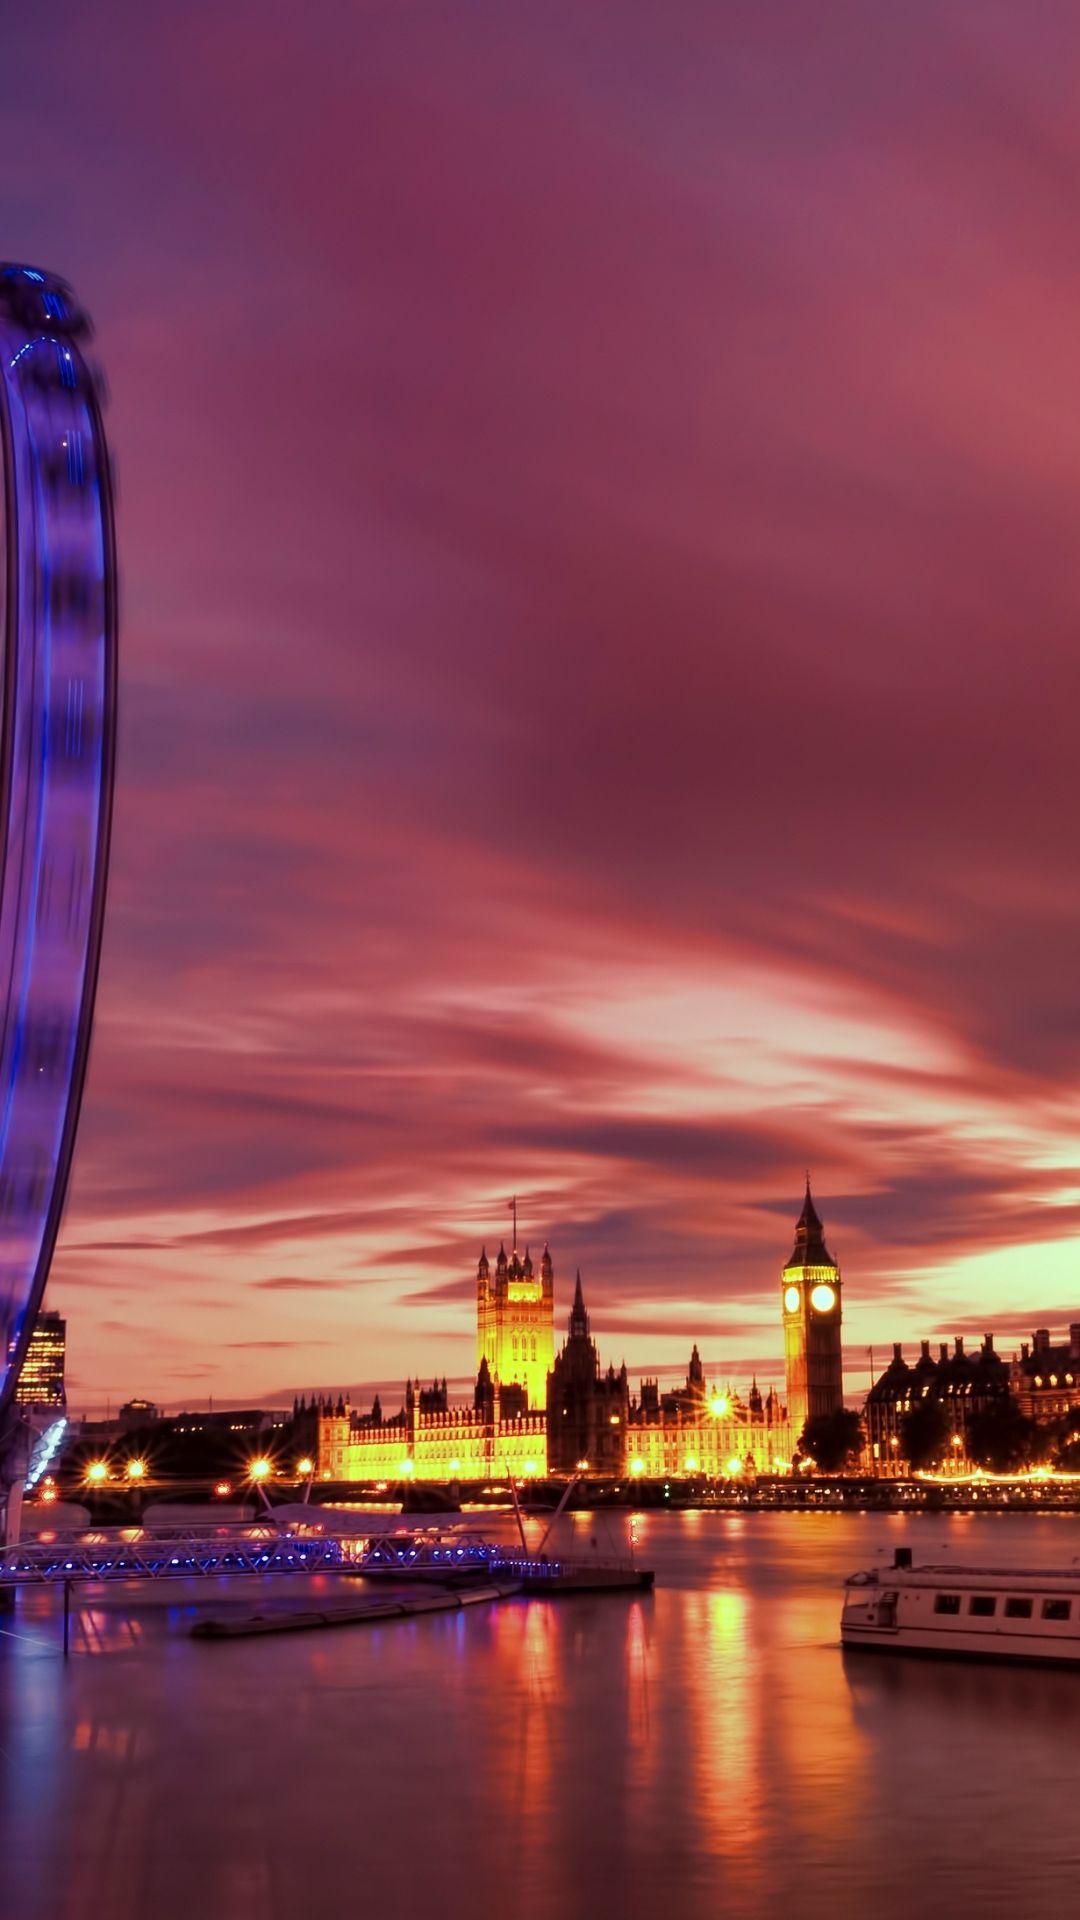 iPhone 6 Plus Wallpaper London 09 Sunset wallpaper, London